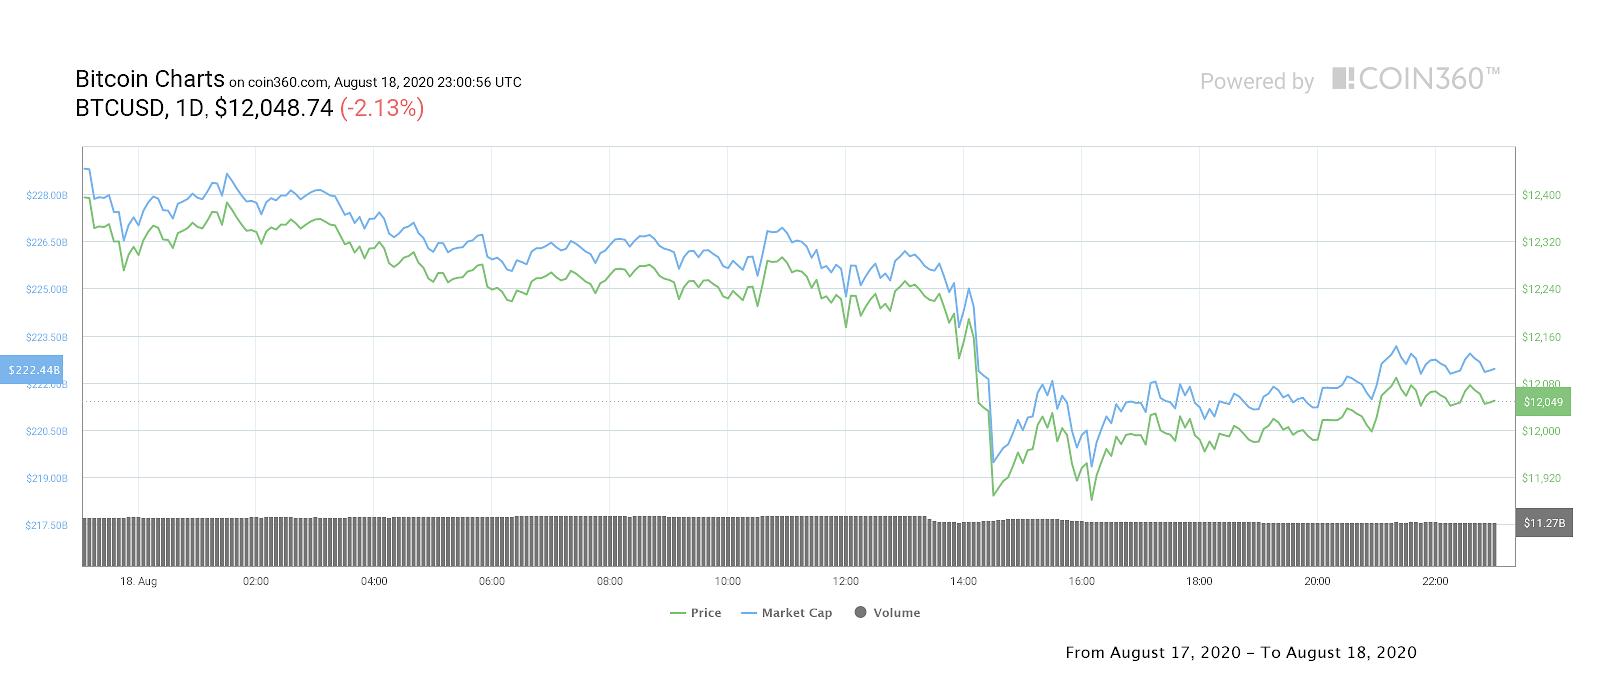 Bitcoin daily price chart. Source: Coin360